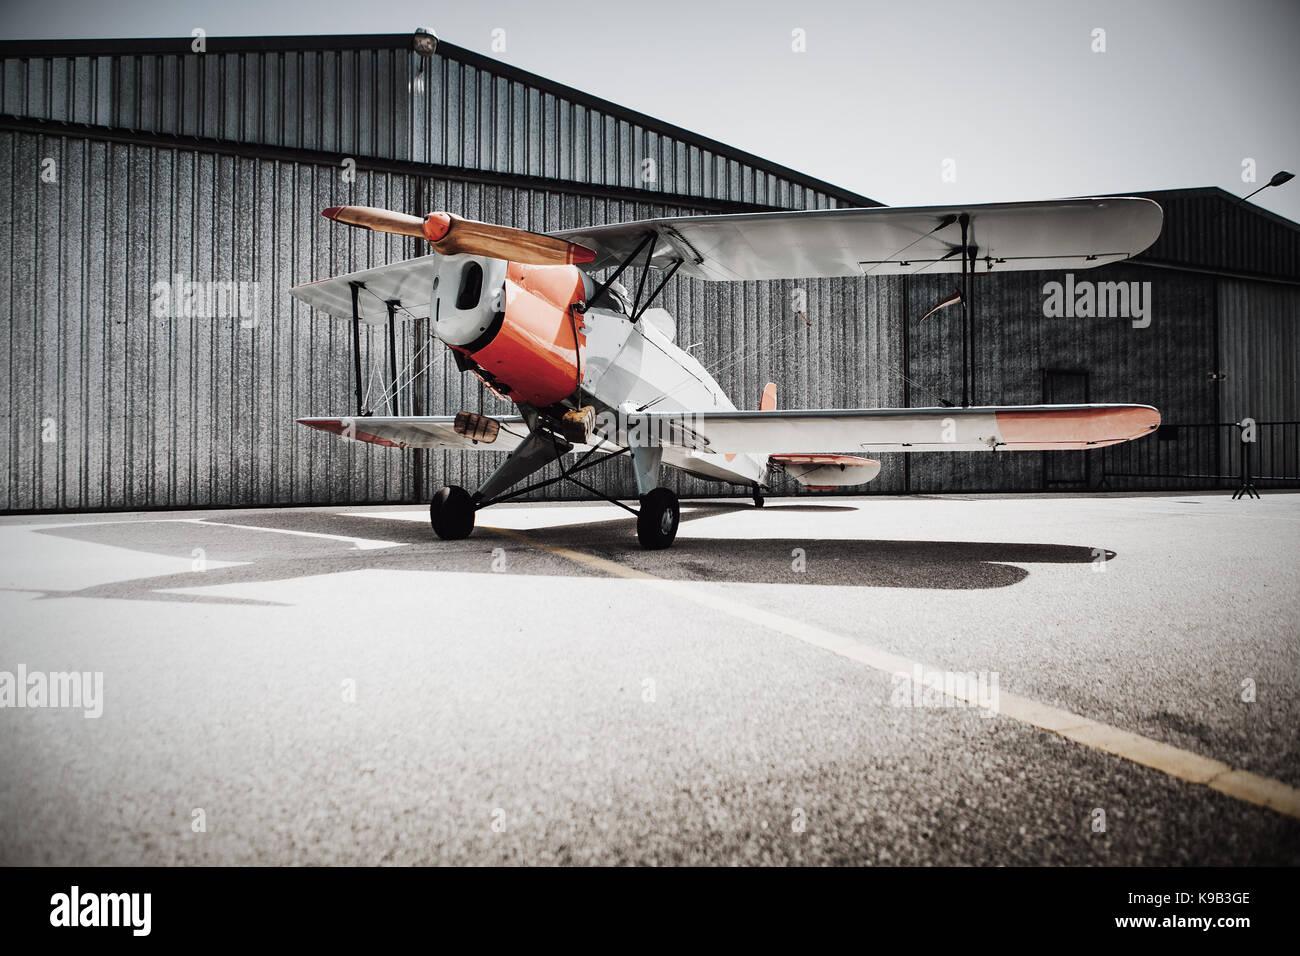 Beautiful vintage plane at the hangar. - Stock Image